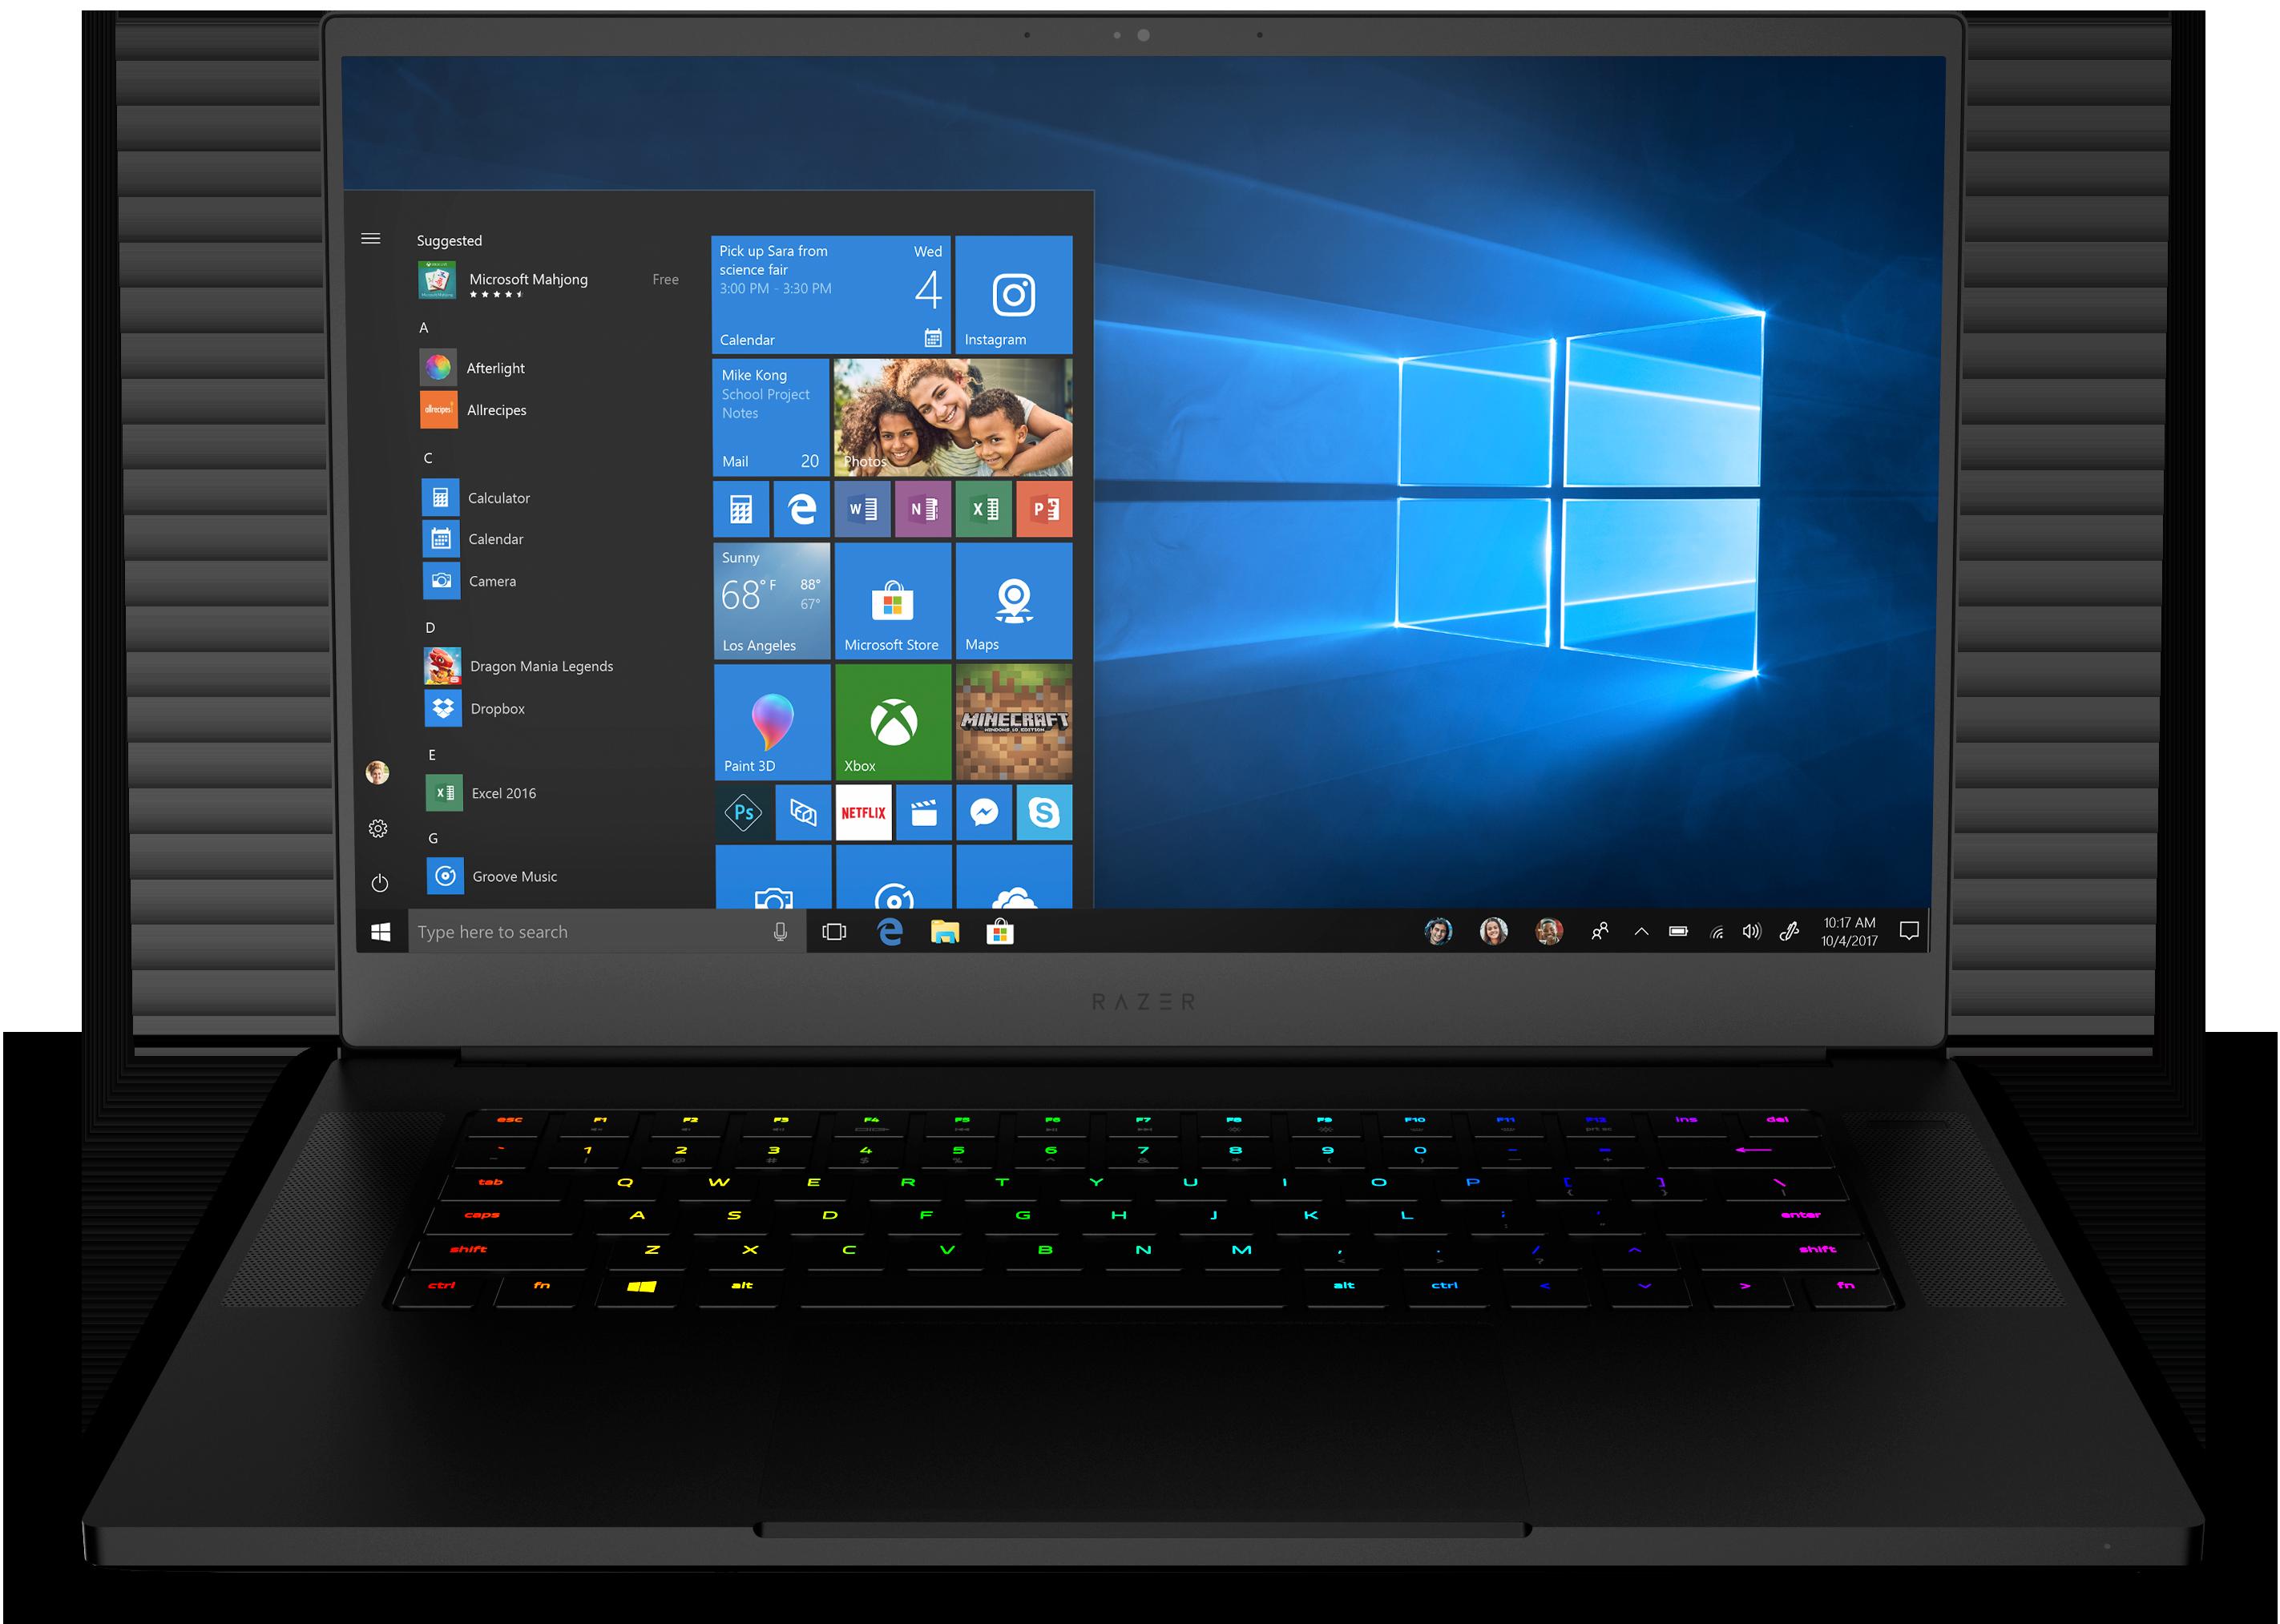 Buy Razer Blade RZ09 2018 Edition Gaming Laptop - Microsoft Store